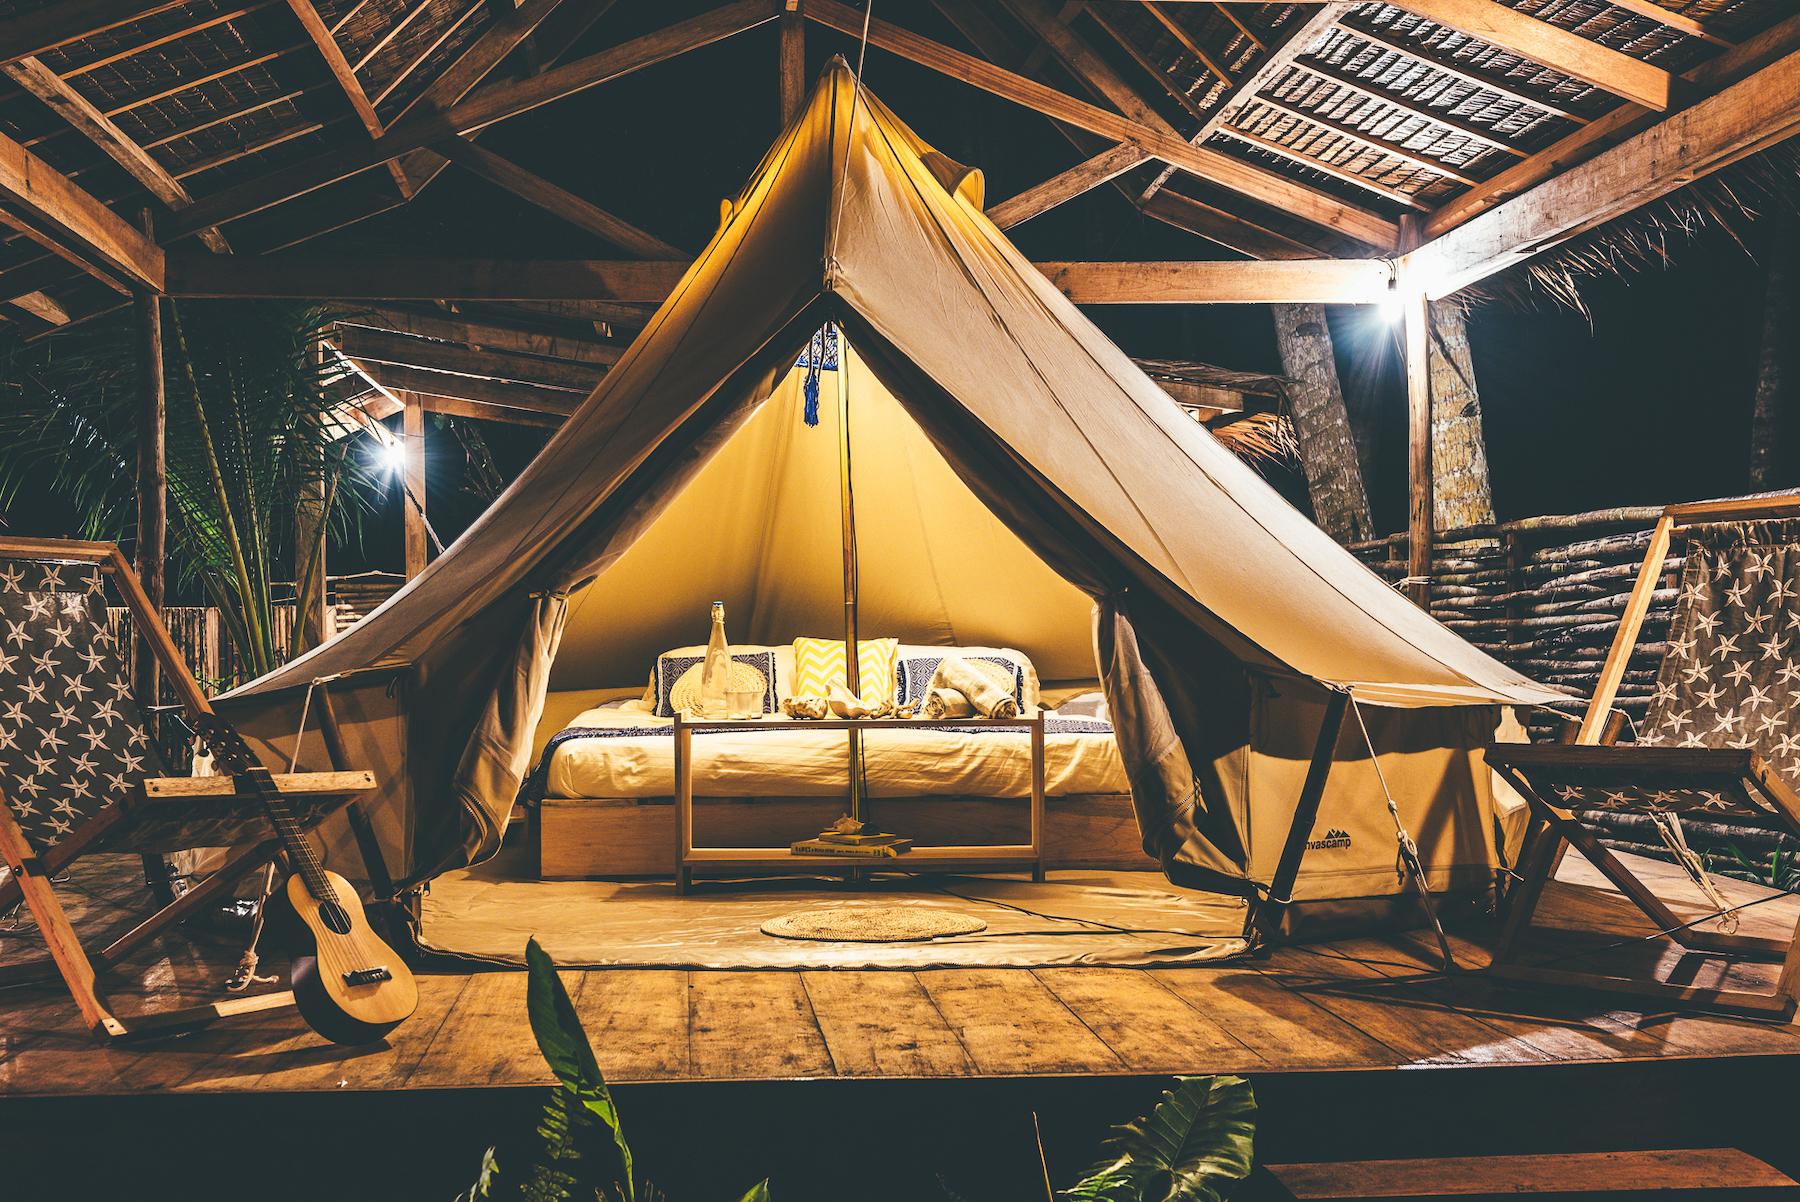 yoga-retreat-soul-tribe-glamping-tent-siargoa-island.jpg